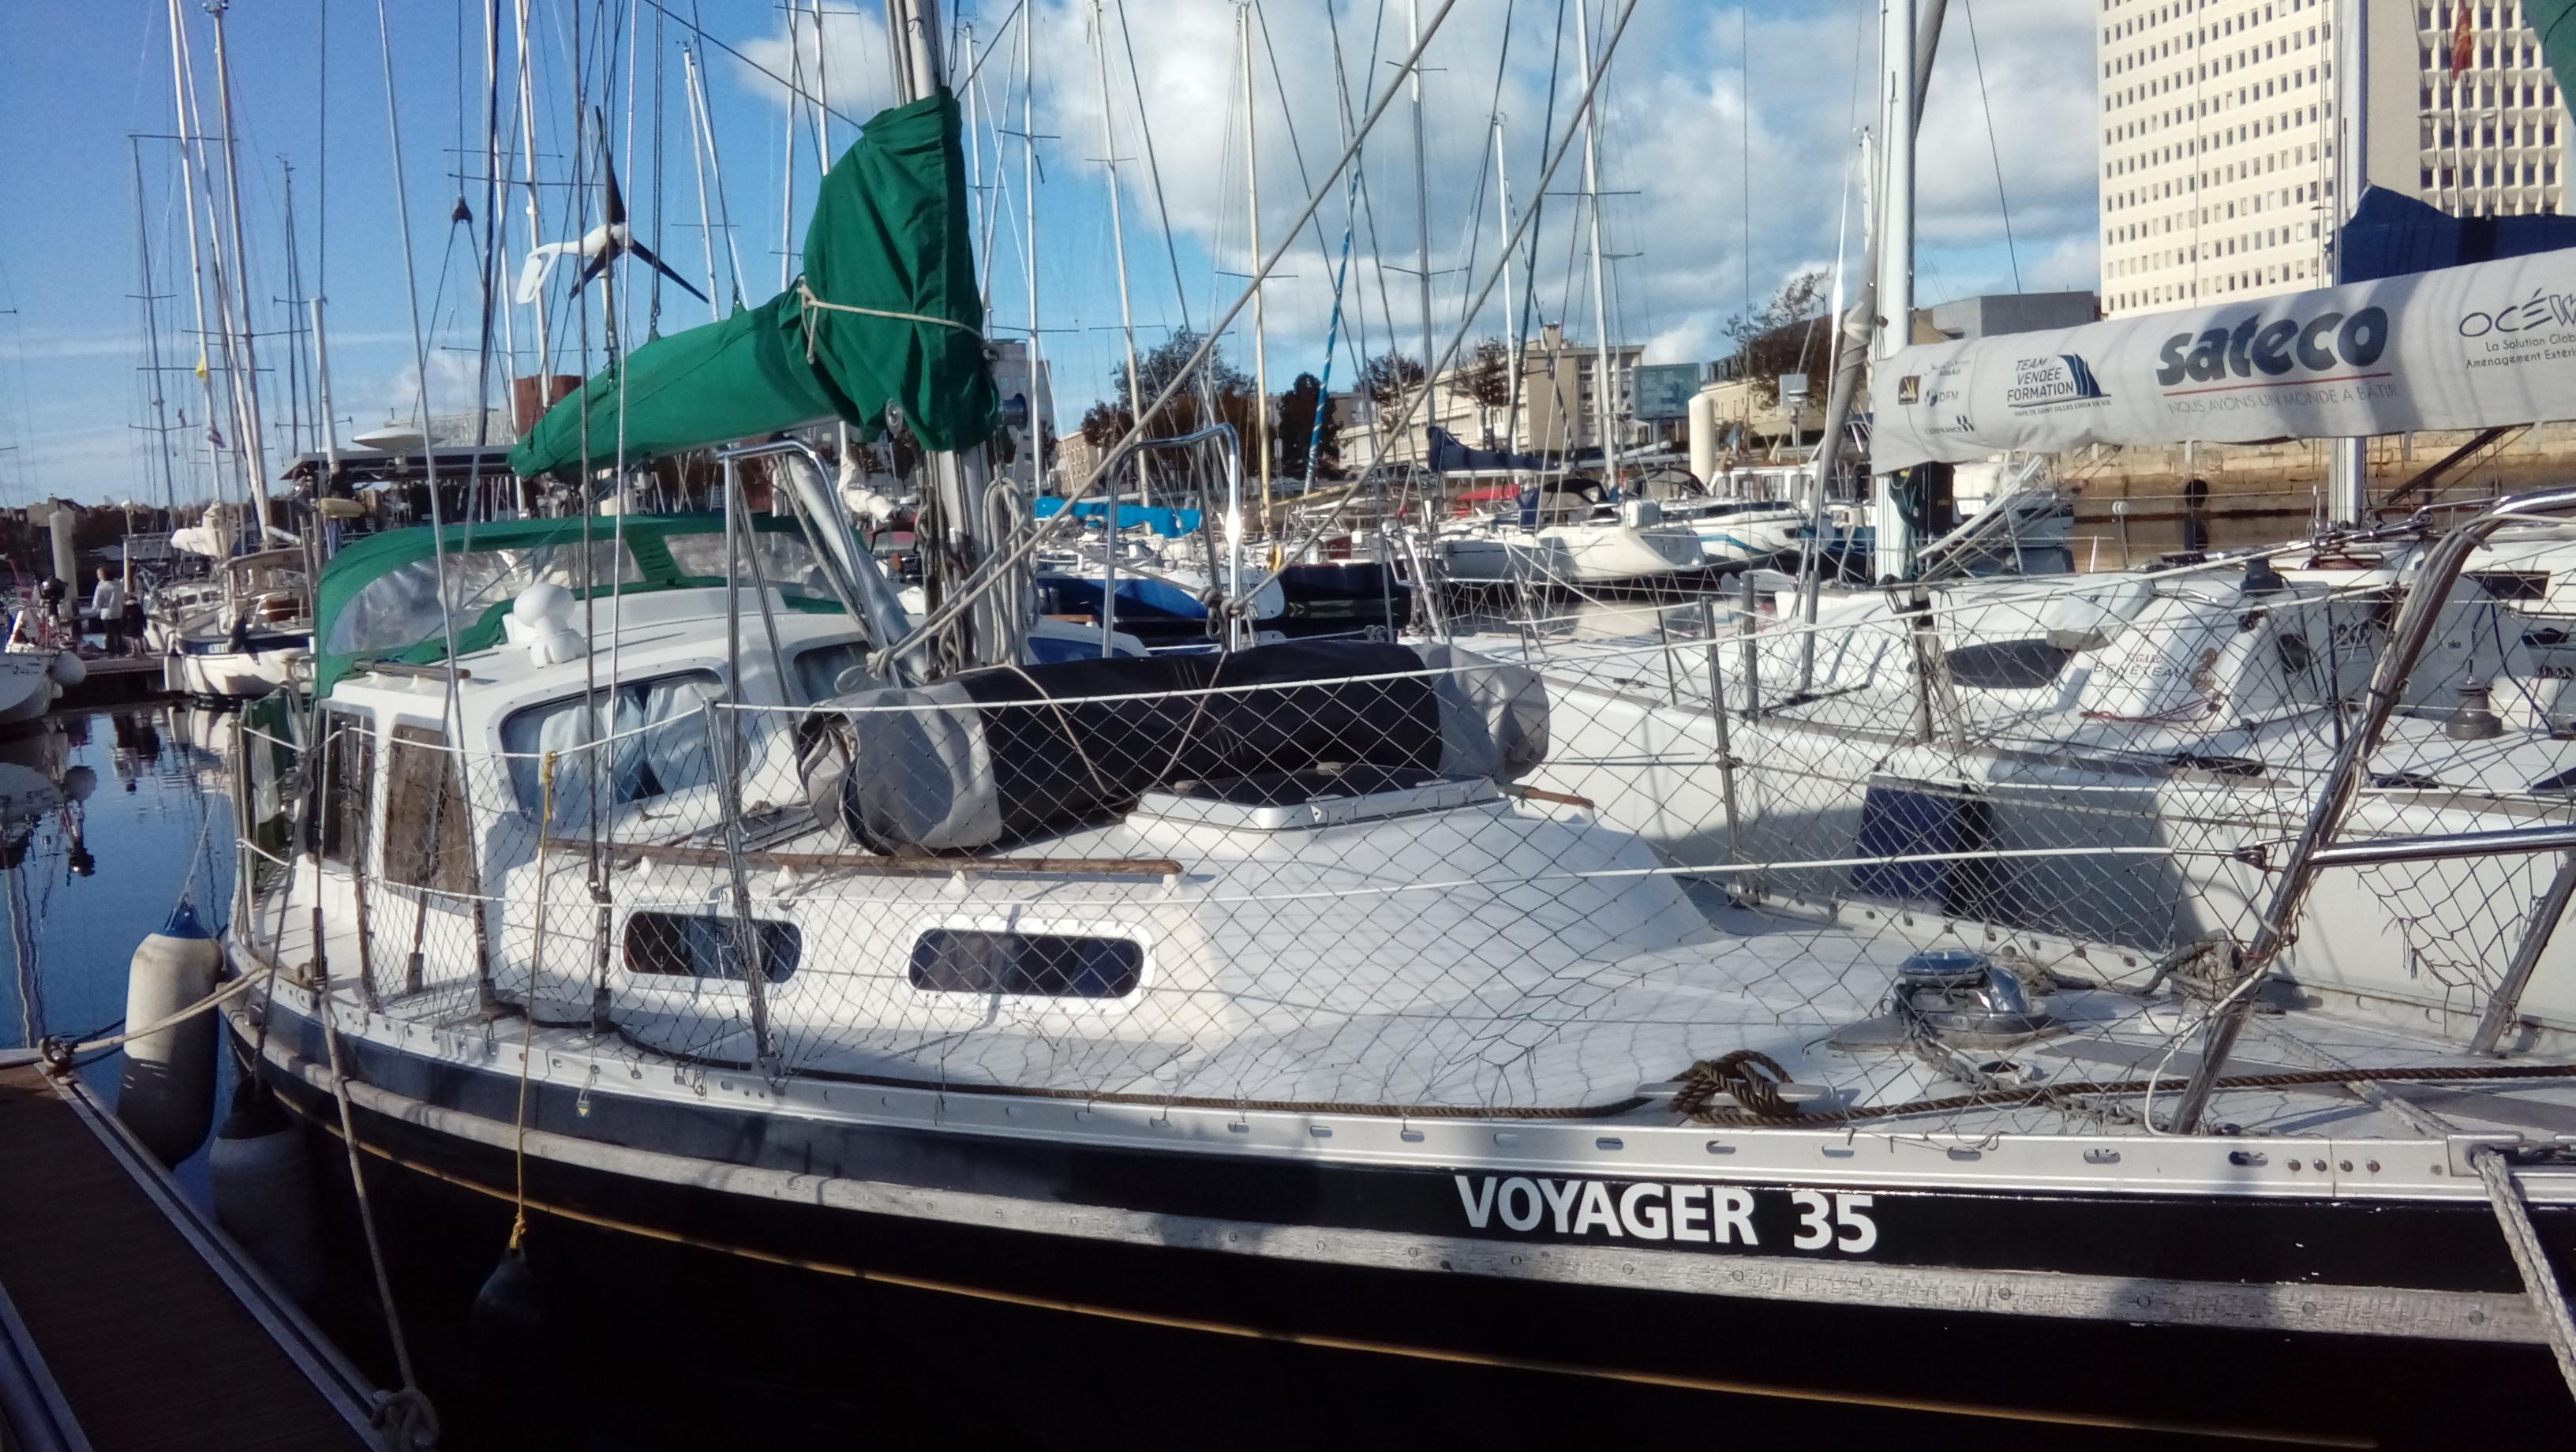 VOYAGER-35-TRIDENT-MARINEoto bateau N°.22.12.2019